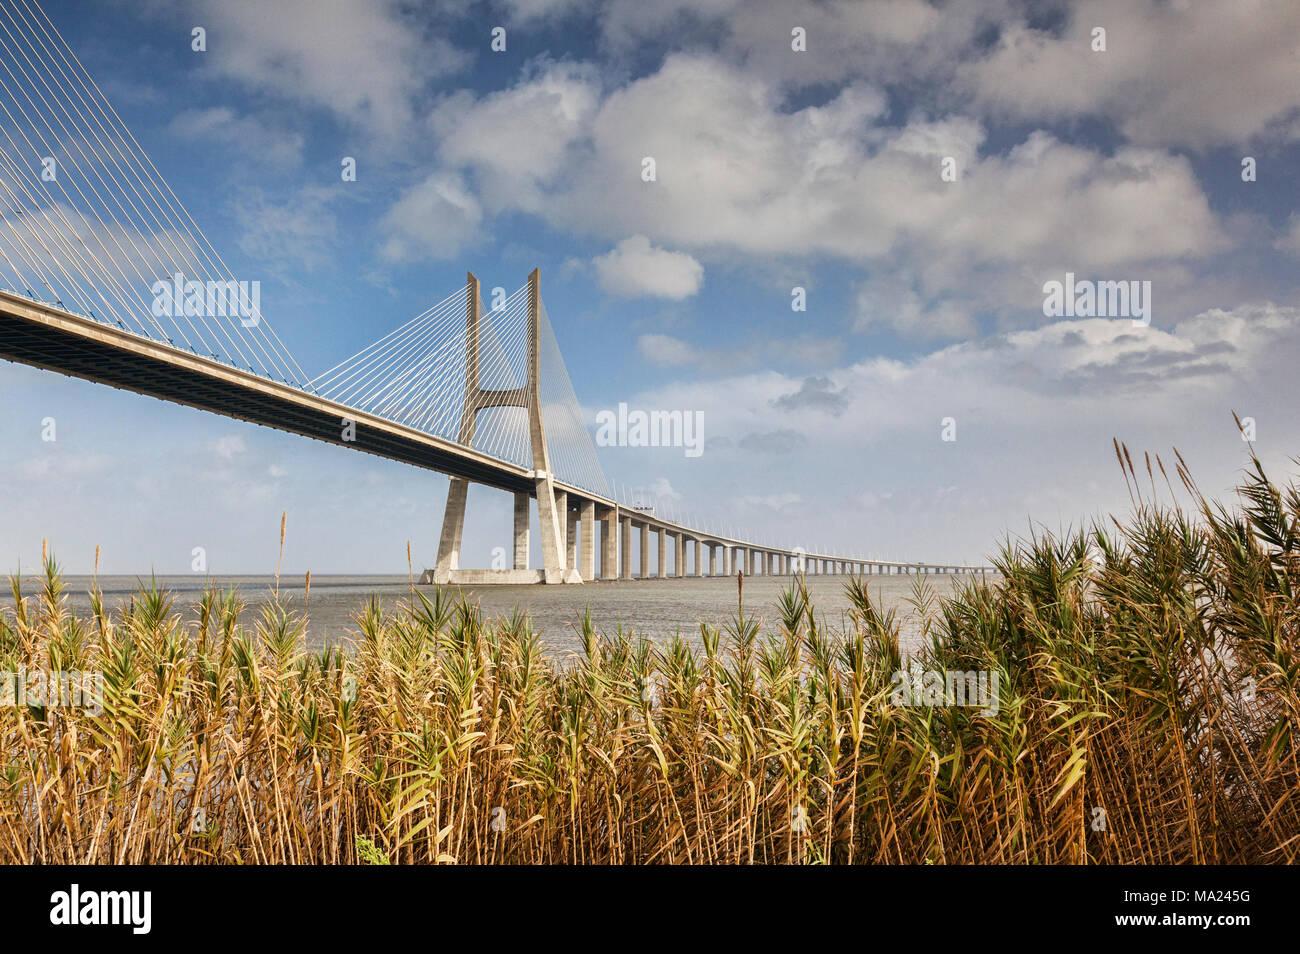 Vasco da Gama Bridge, the 17km cable stayed bridge which spans the River Tagus near Lisbon, Portugal. - Stock Image